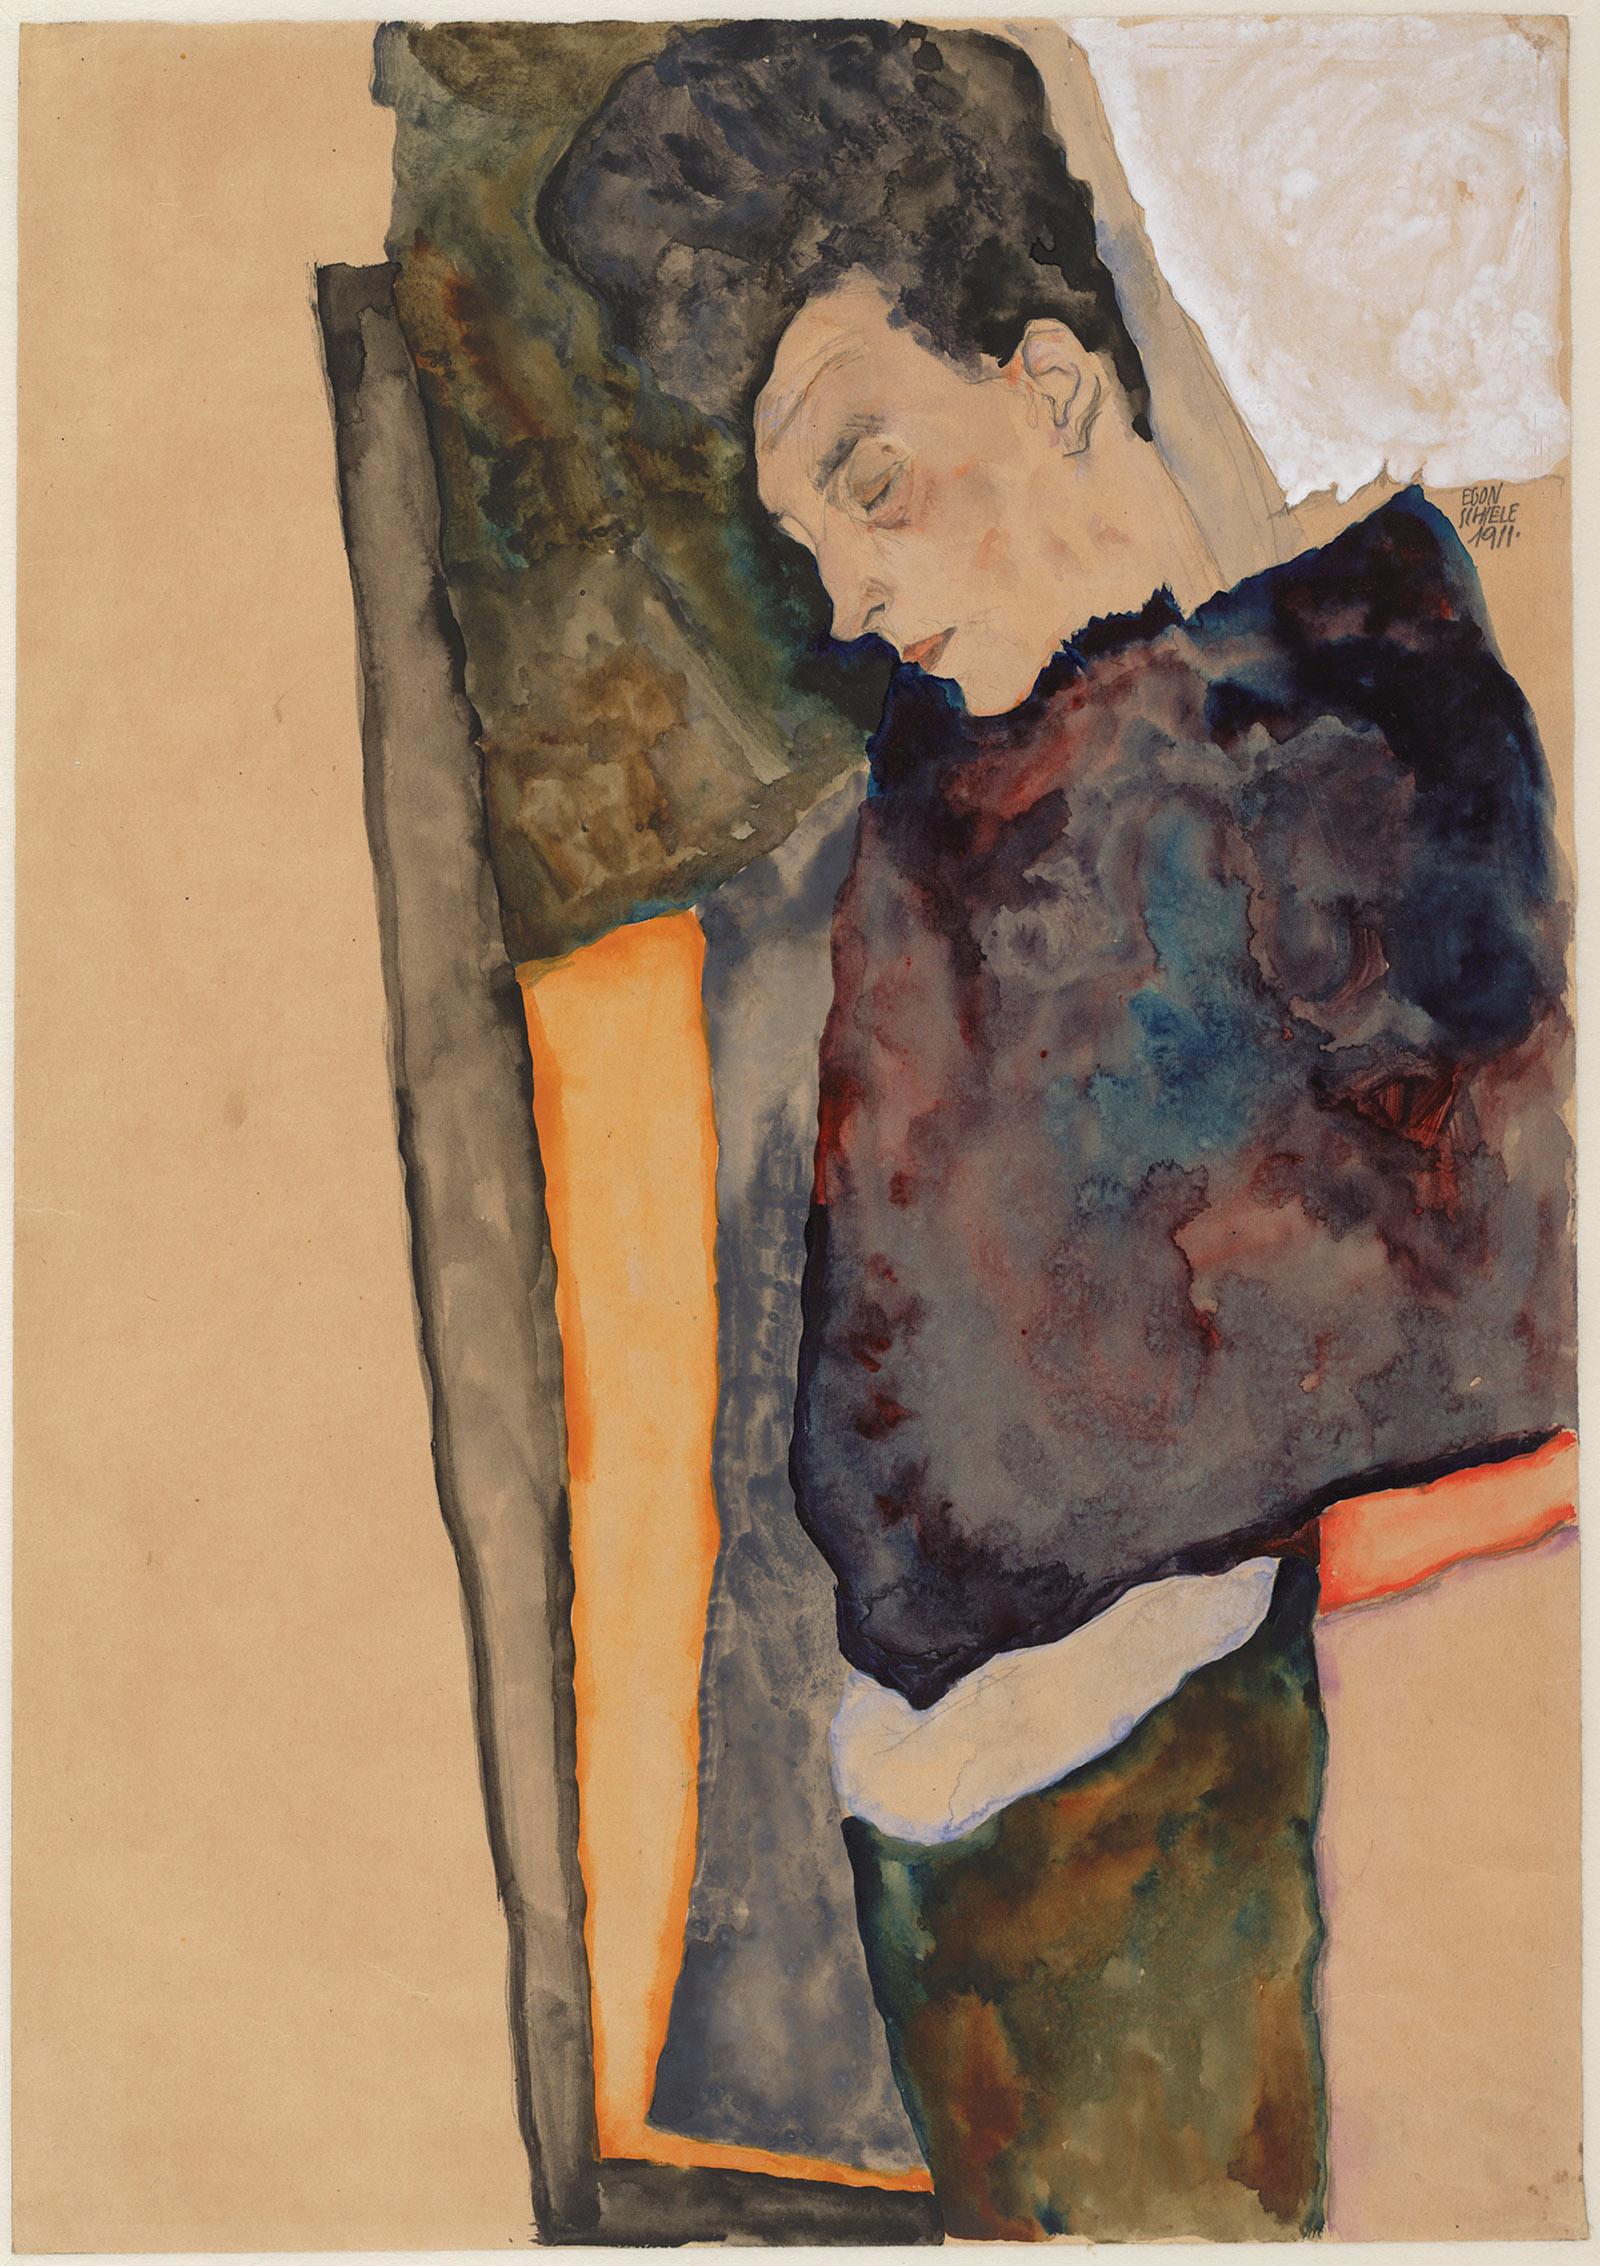 Egon Schiele: The Artist's Mother, Sleeping, 1911